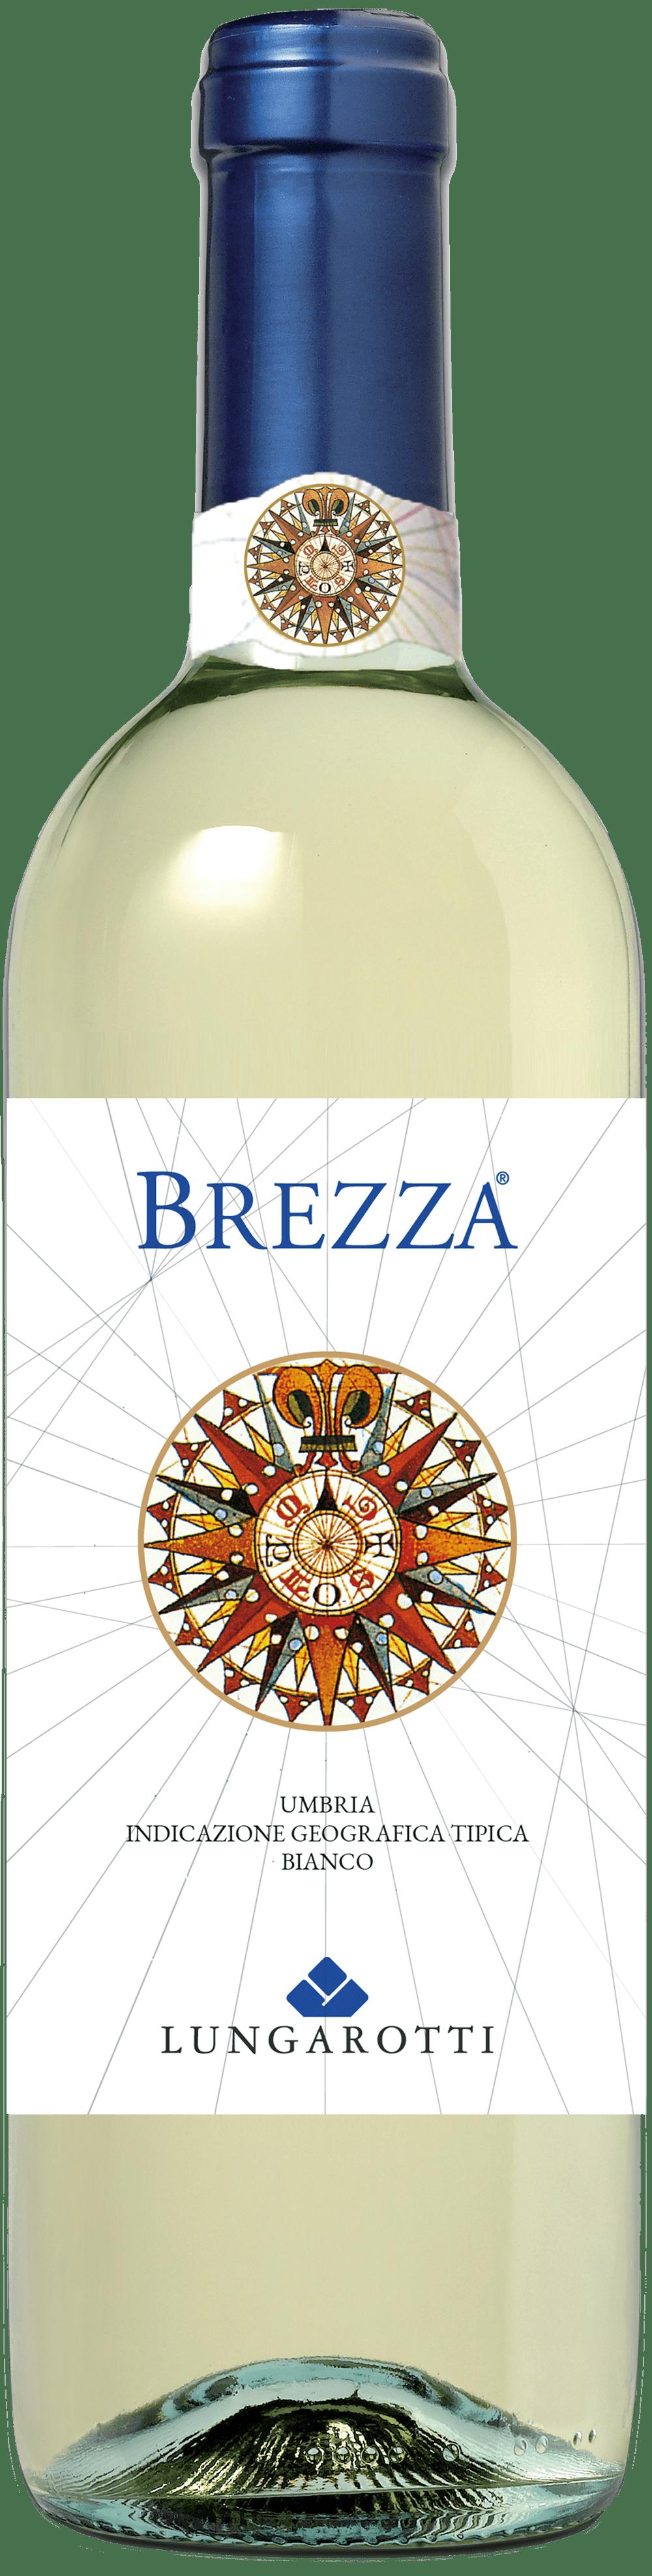 Brezza Bianco Umbria IGT